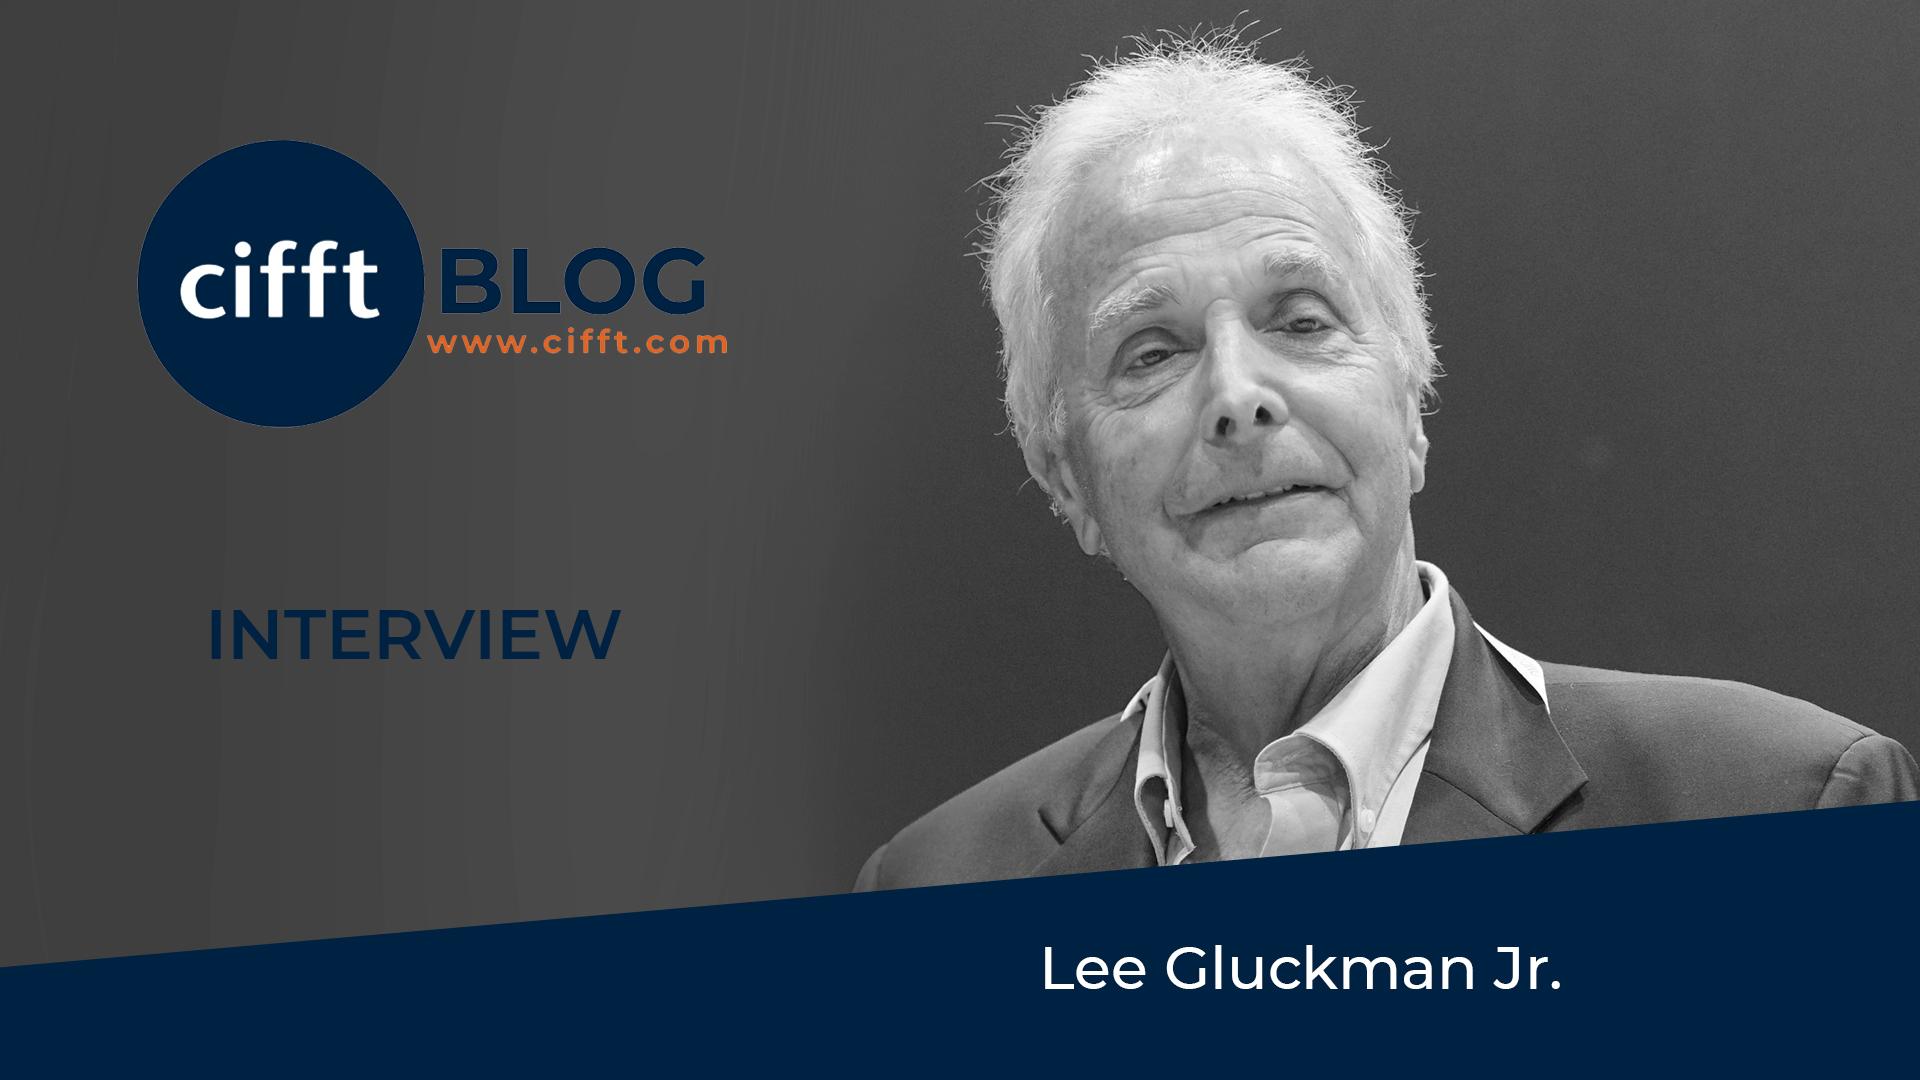 Lee Gluckman Jr